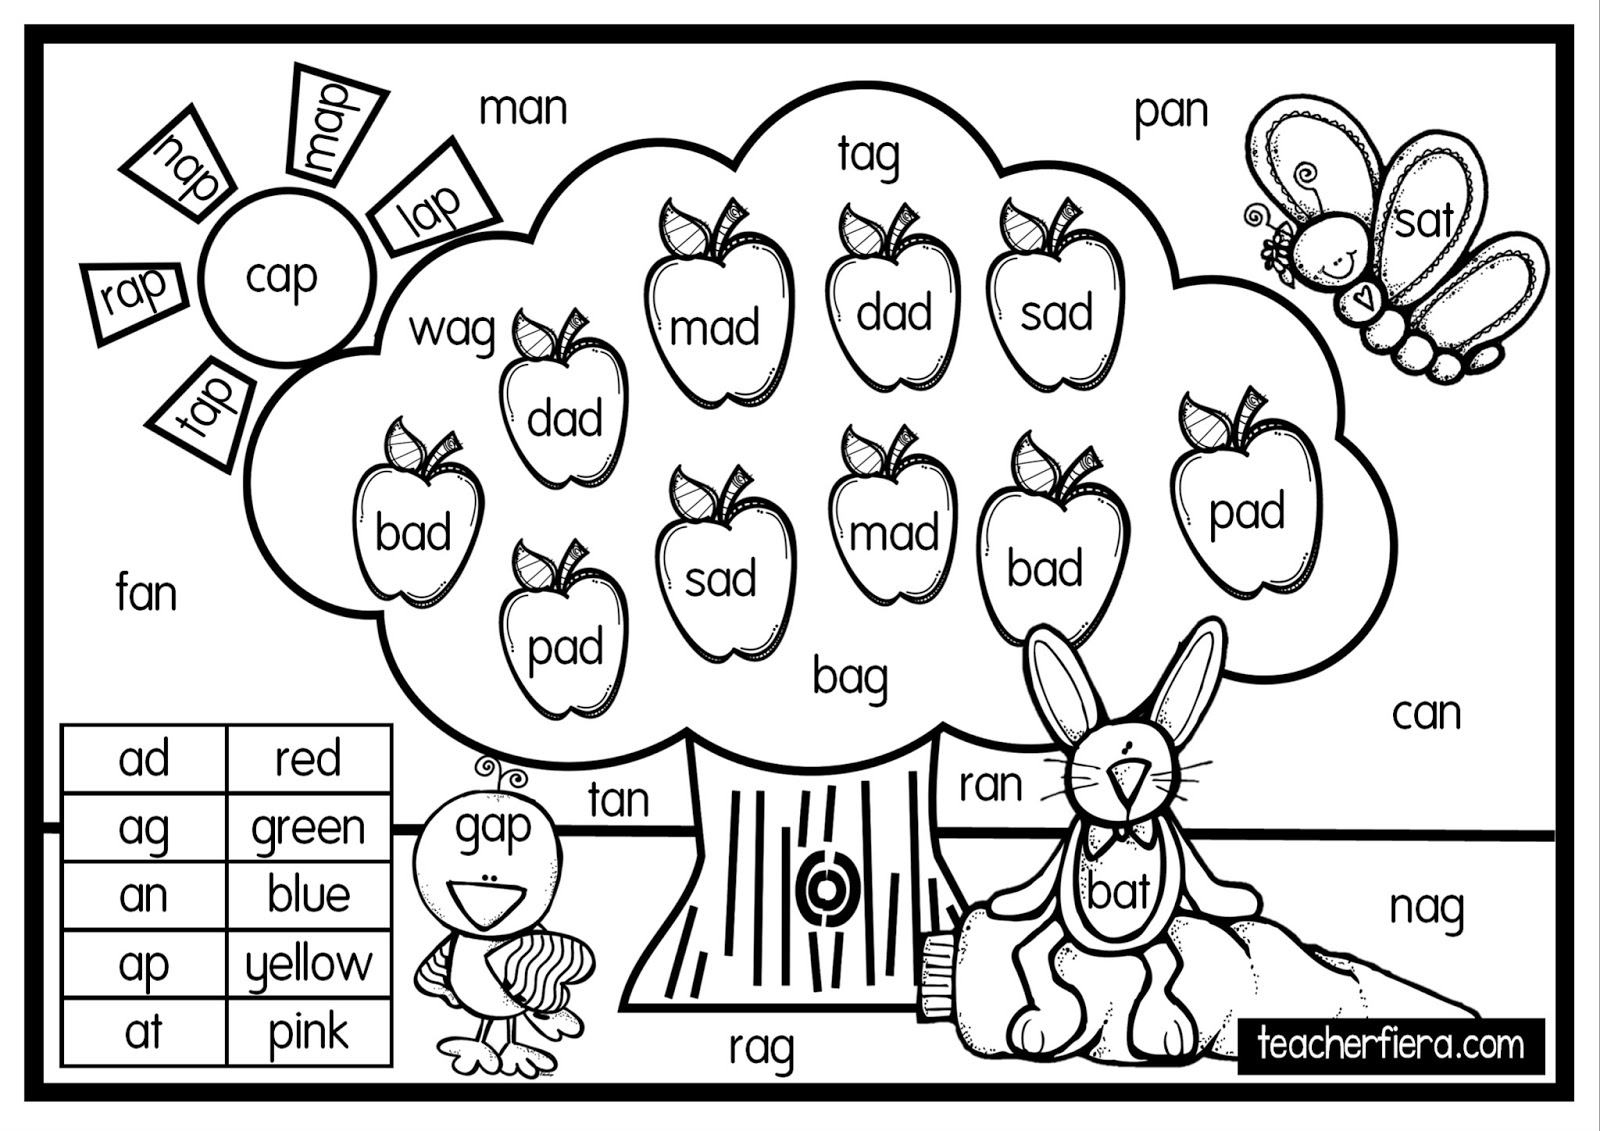 Teacherfiera Colour By Code Word Families